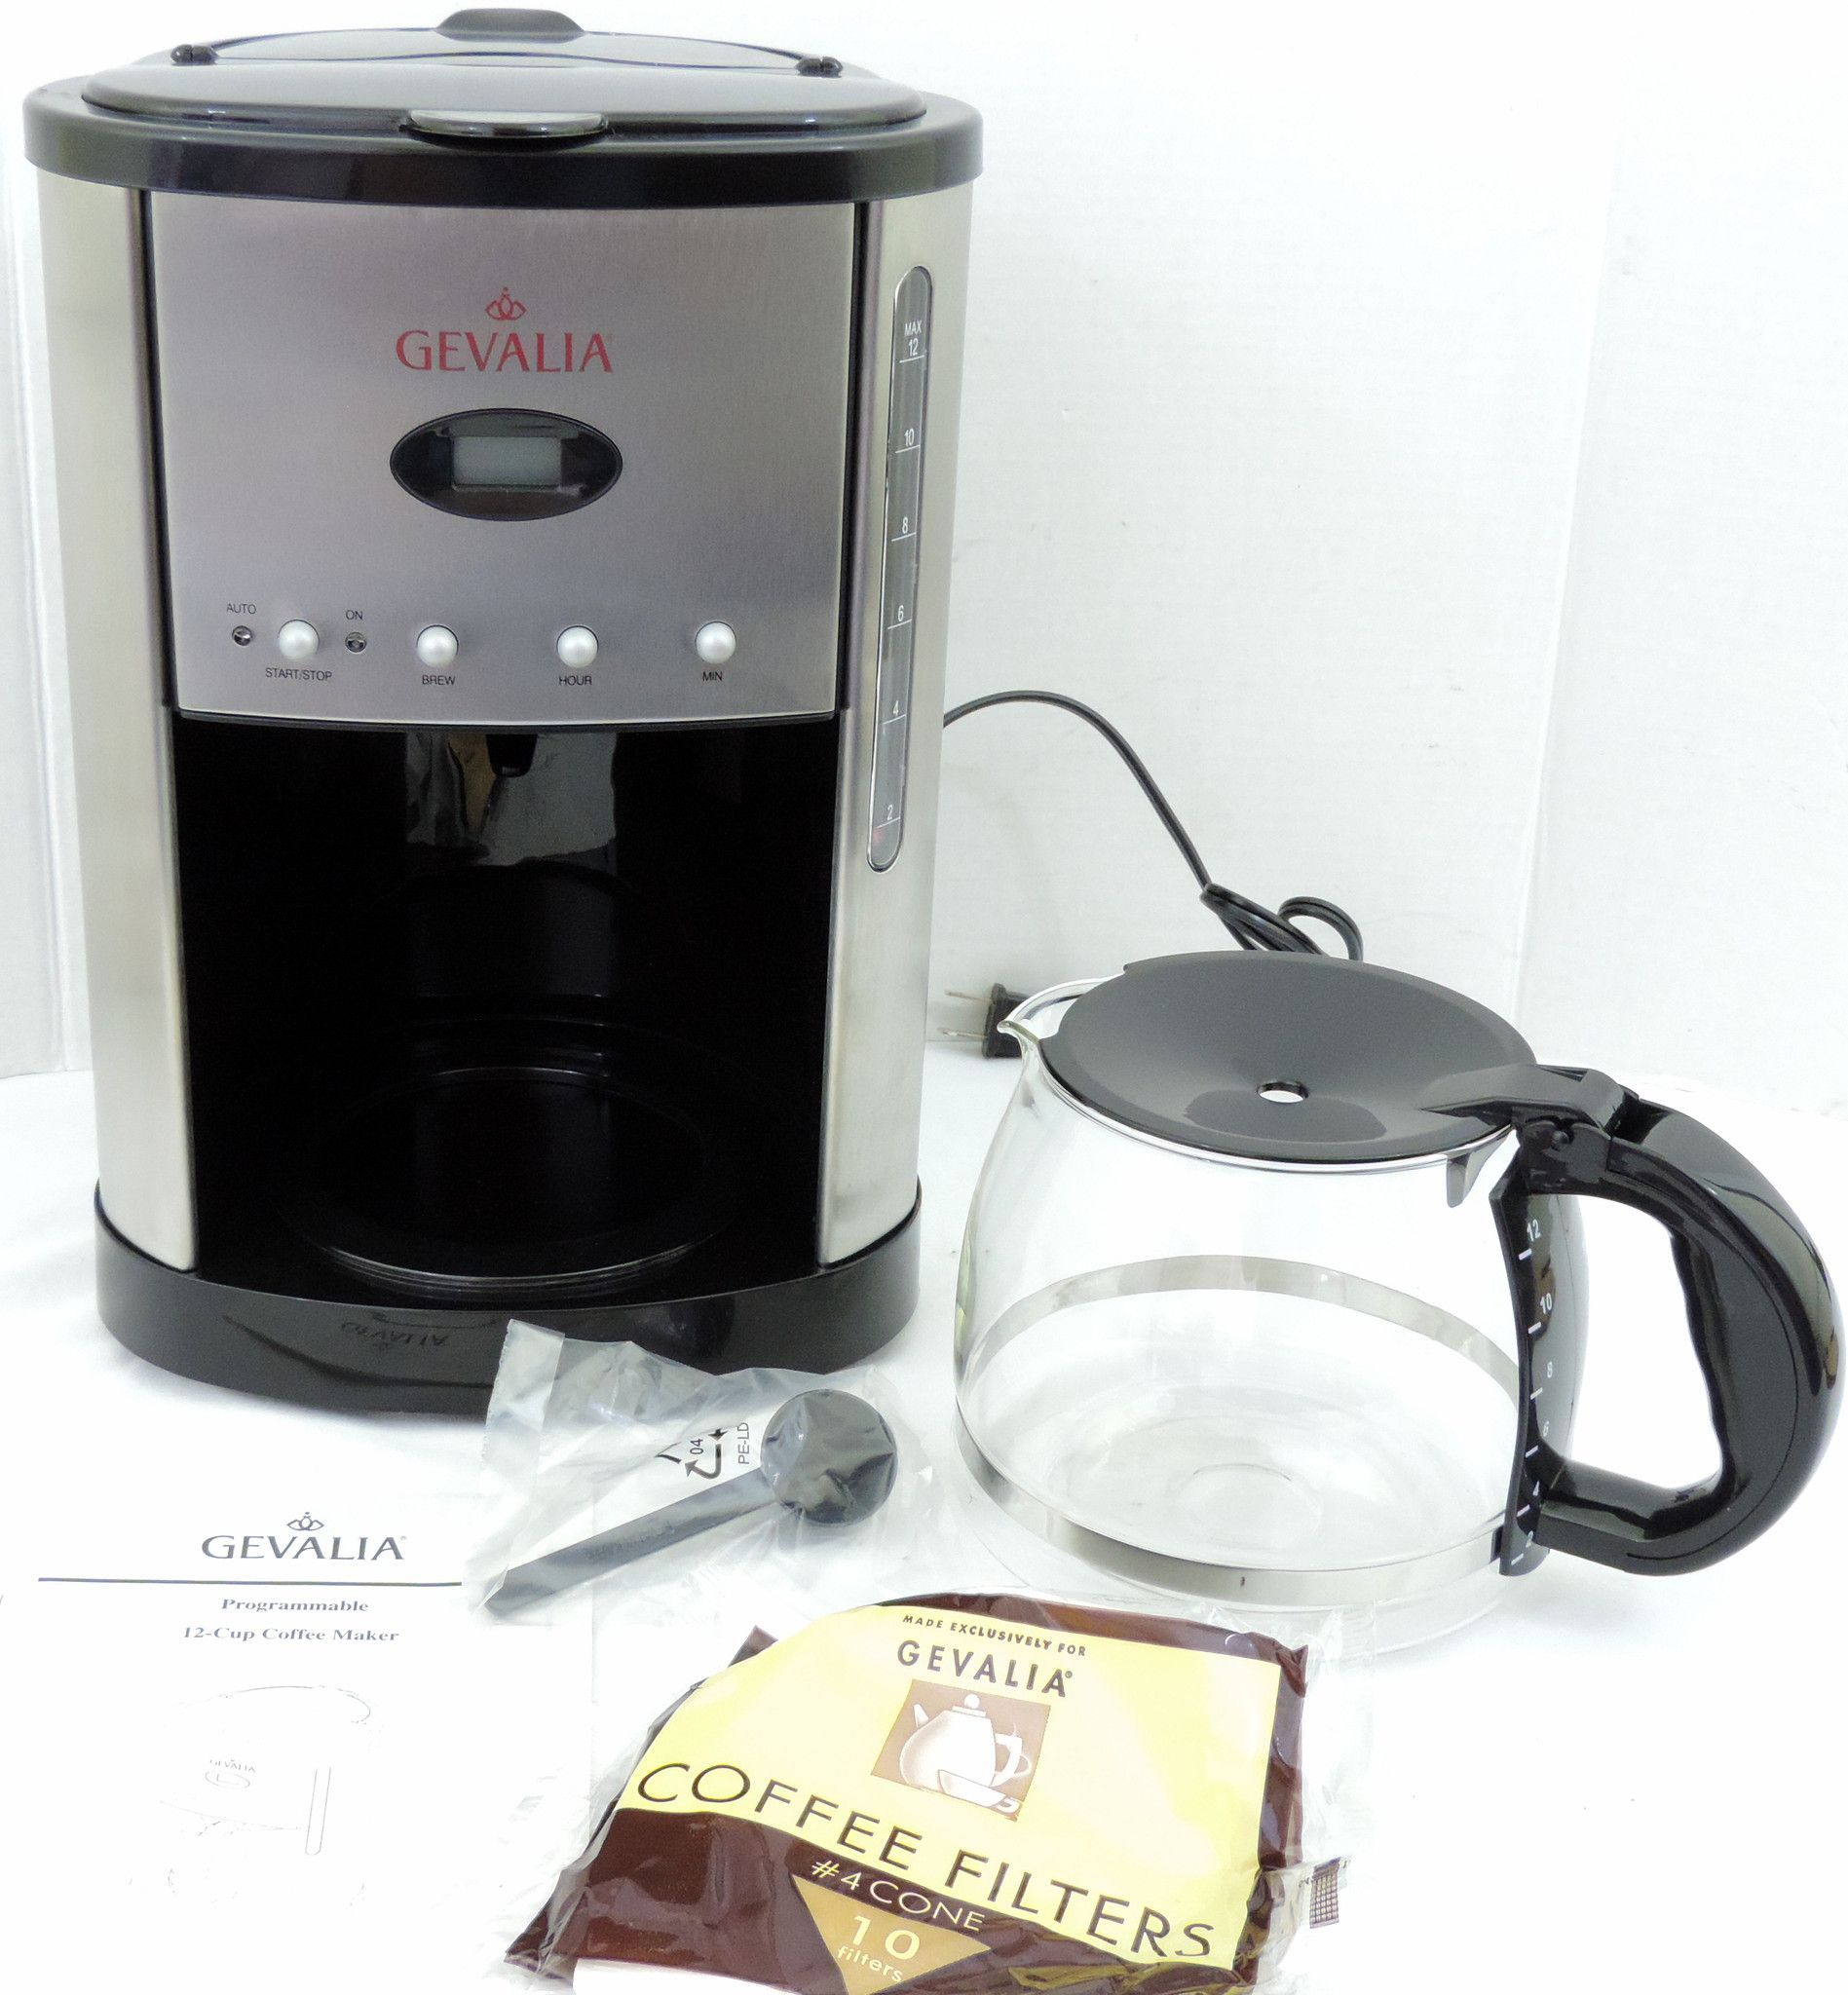 gevalia coffee maker 12 cup coffee drinker rh cf jiraygroup com Suntour XCC Xcc Mixer